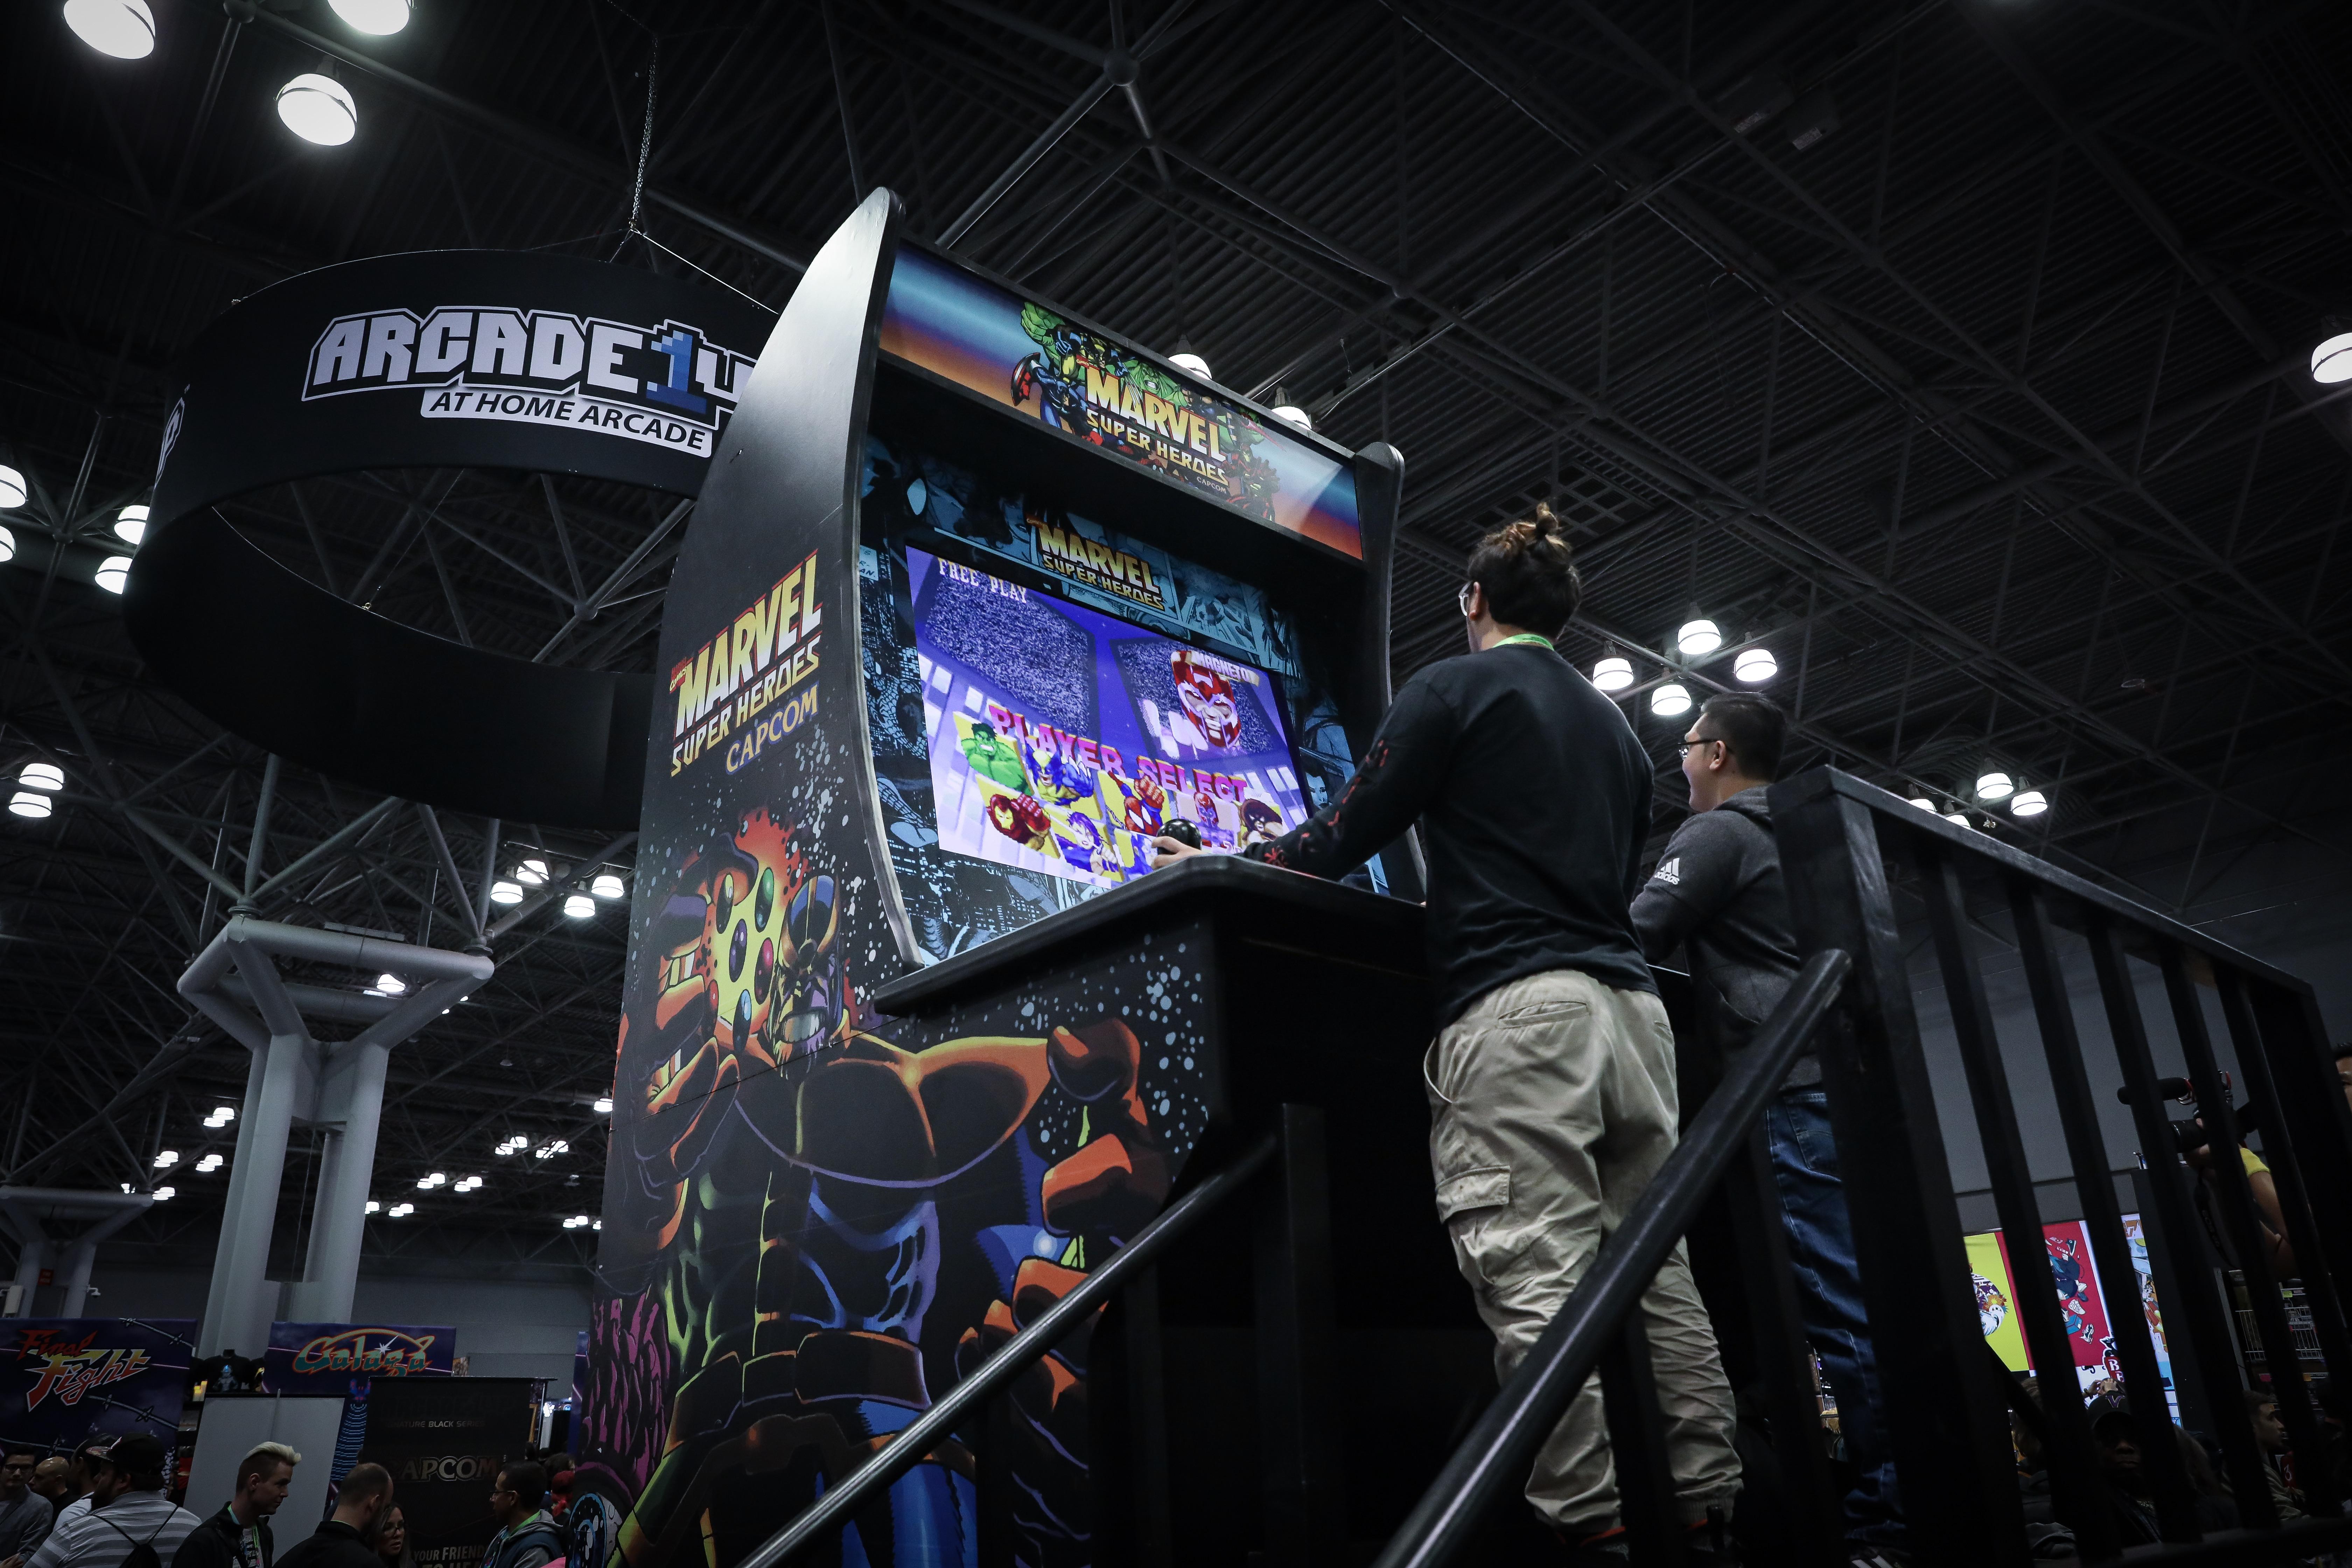 <div>HHW Gaming: 'Mortal Kombat' & 'Injustice' Studio Working On New Marvel Fighting Game: Report</div>